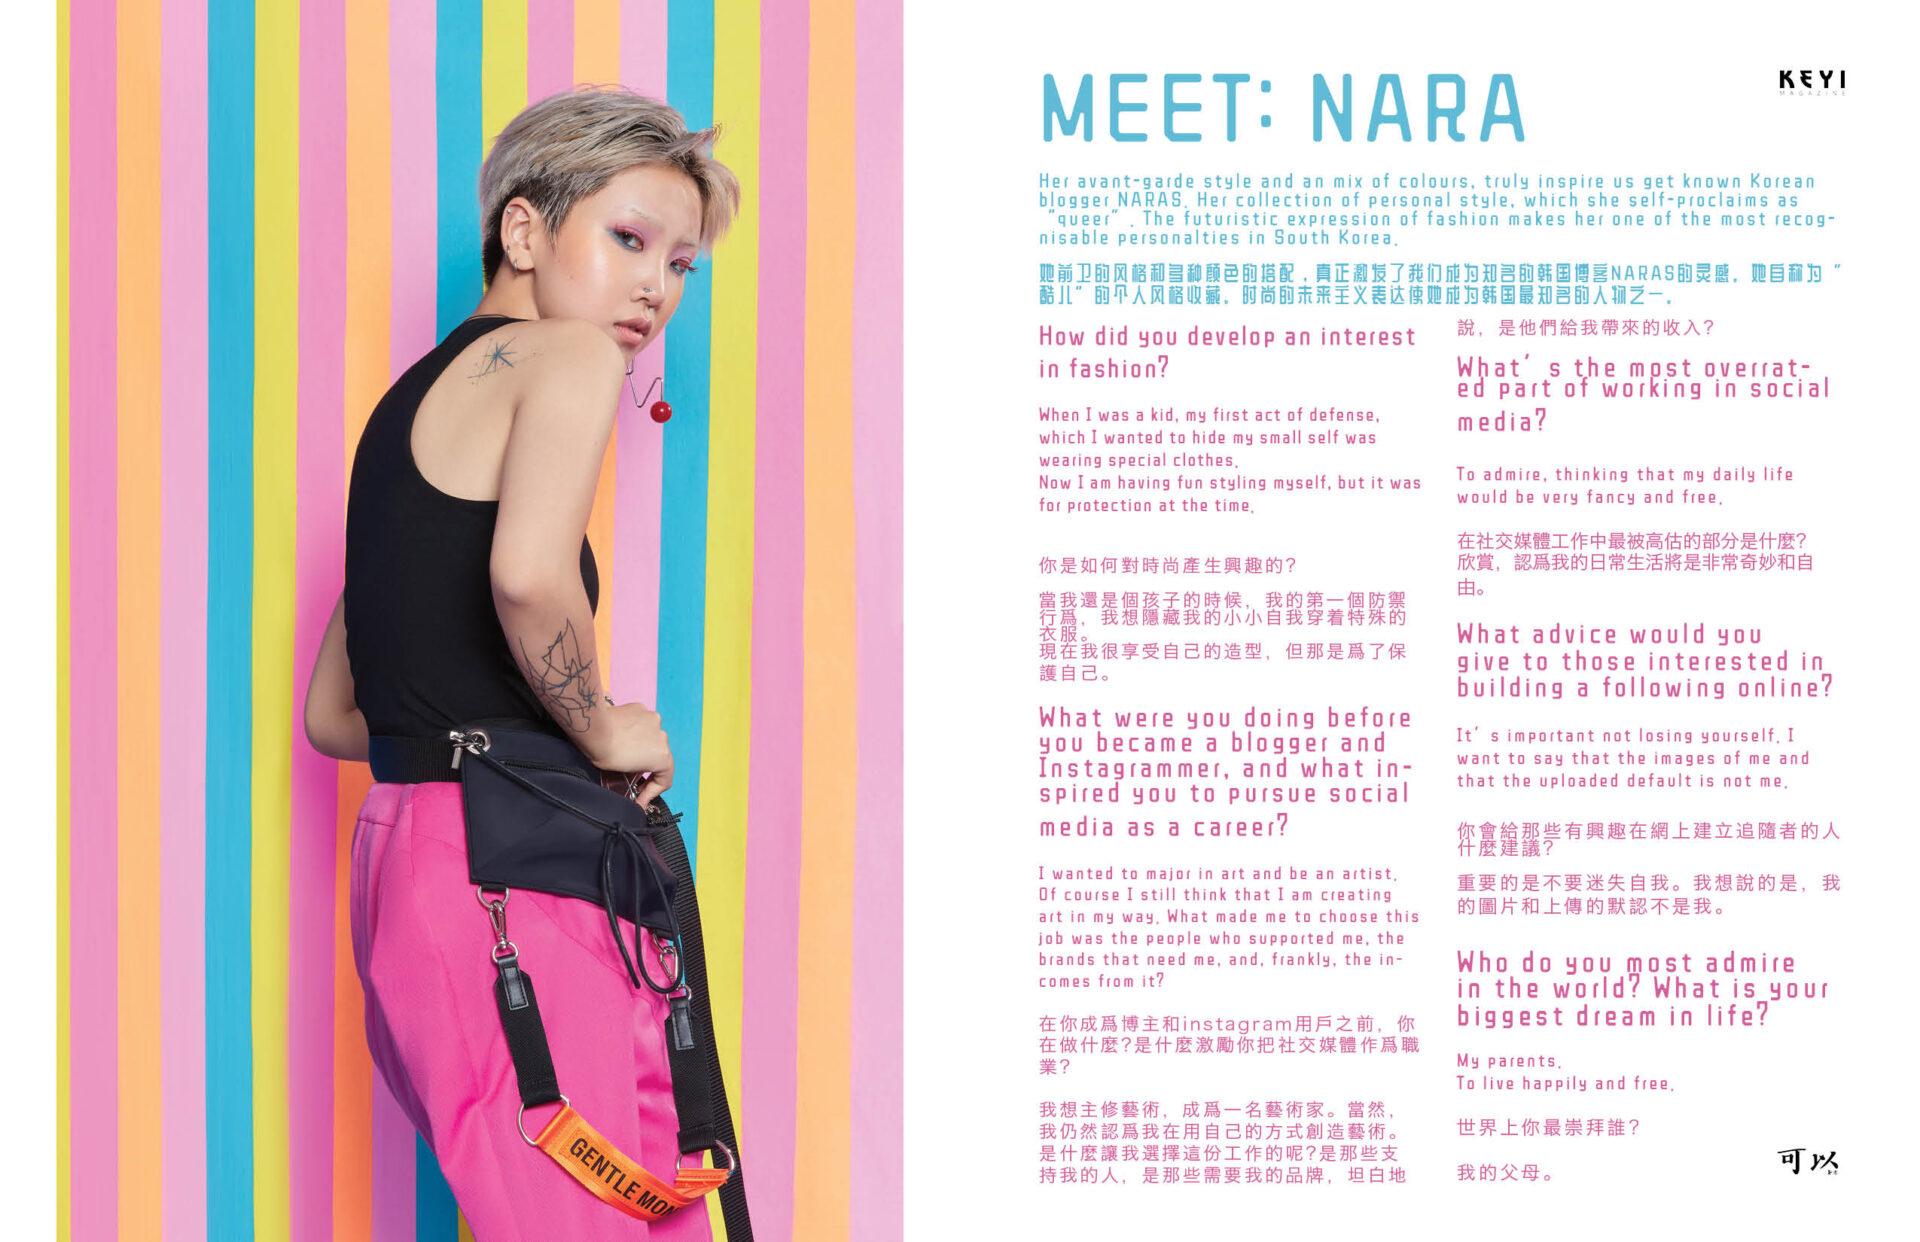 MEET:NARA by interview and photos Grzegorz Bacinski & Izabella Chrobok